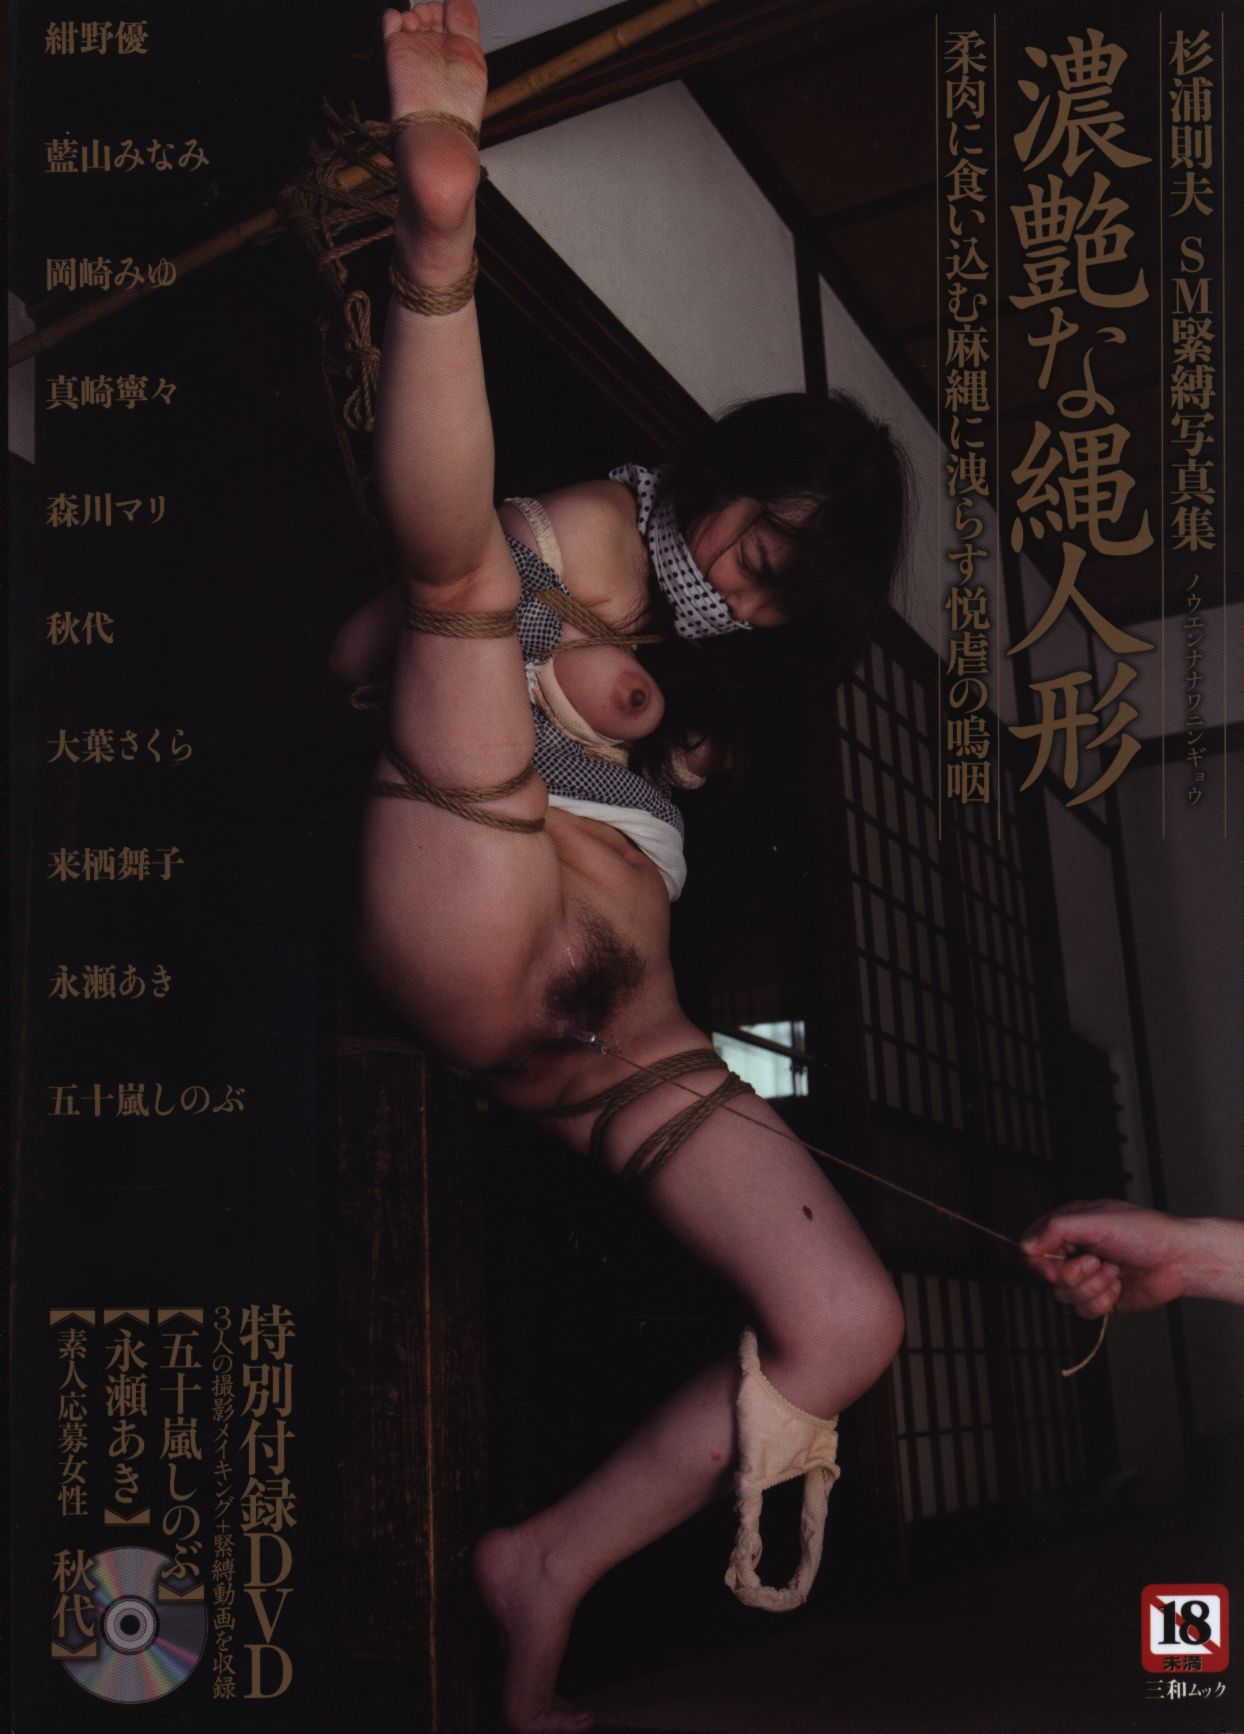 norio sugiura japanese bondage